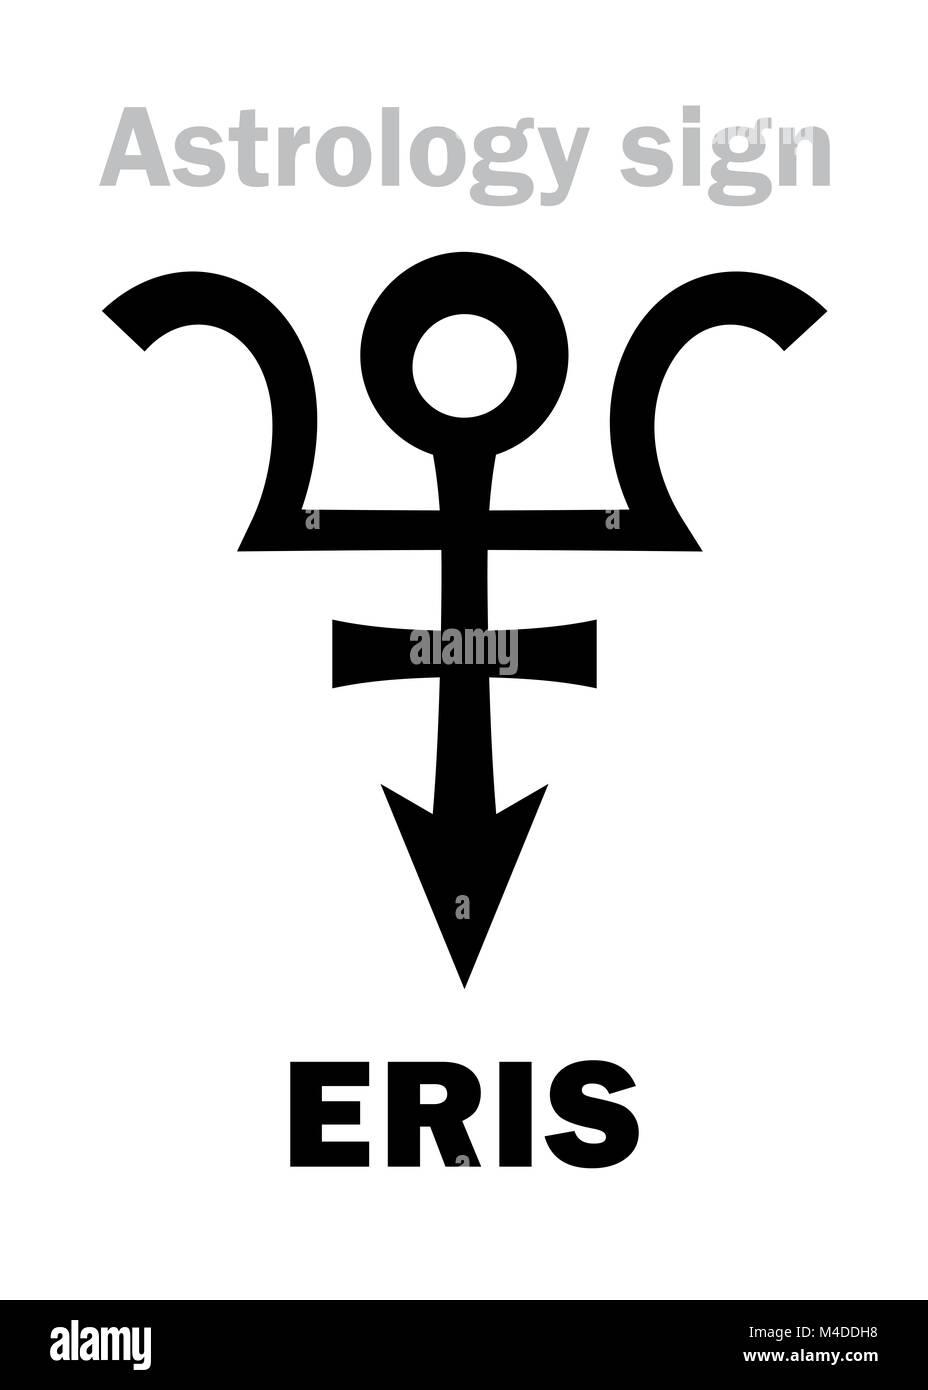 Astrology: planet ERIS - Stock Image